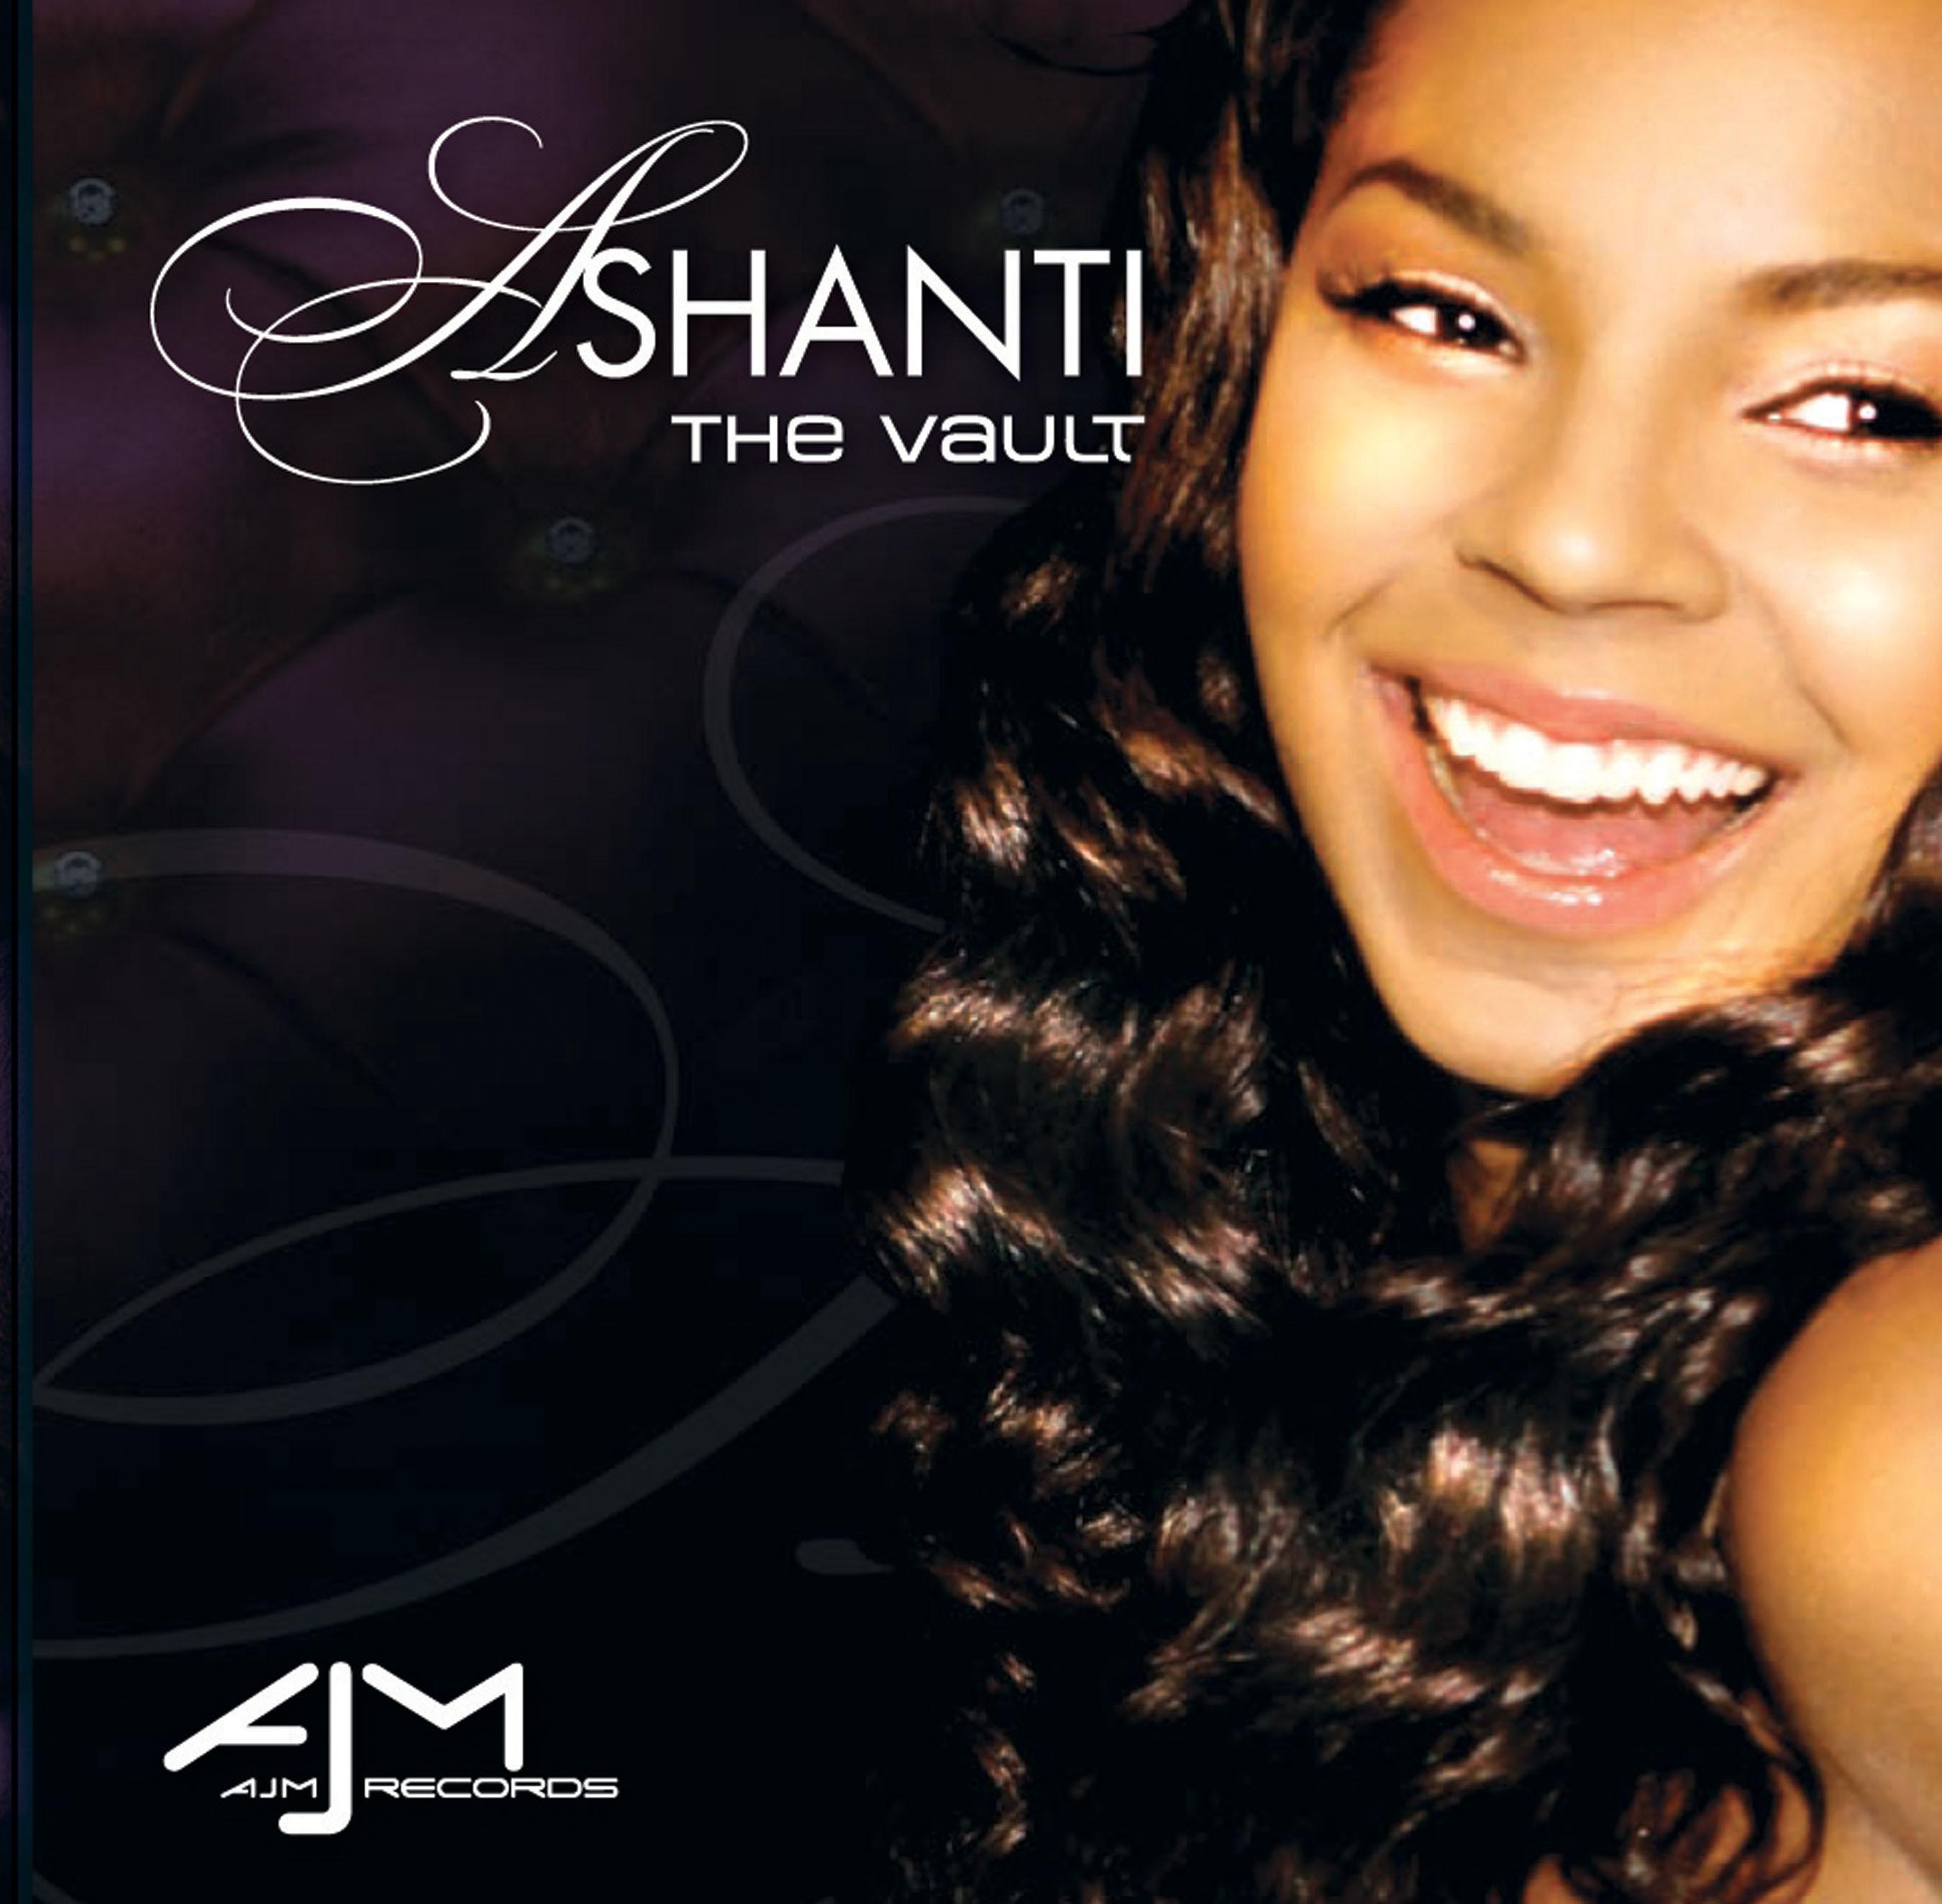 Ashanti - Images Gallery